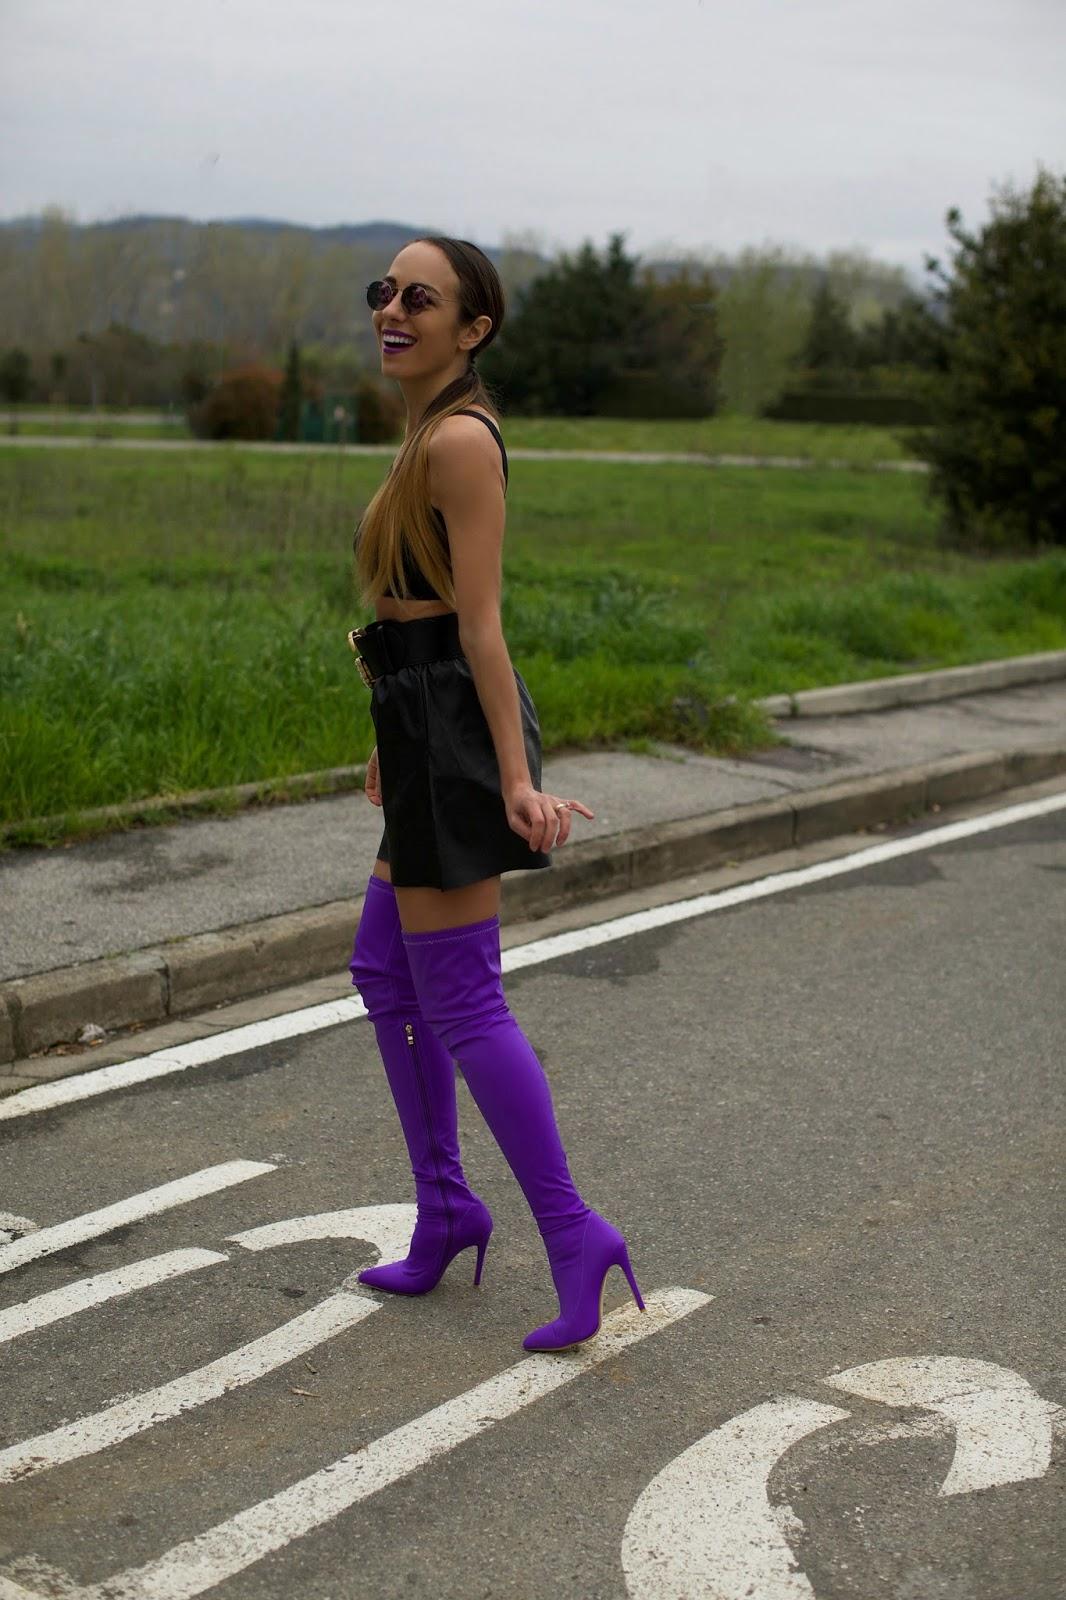 tendenza ultra violet